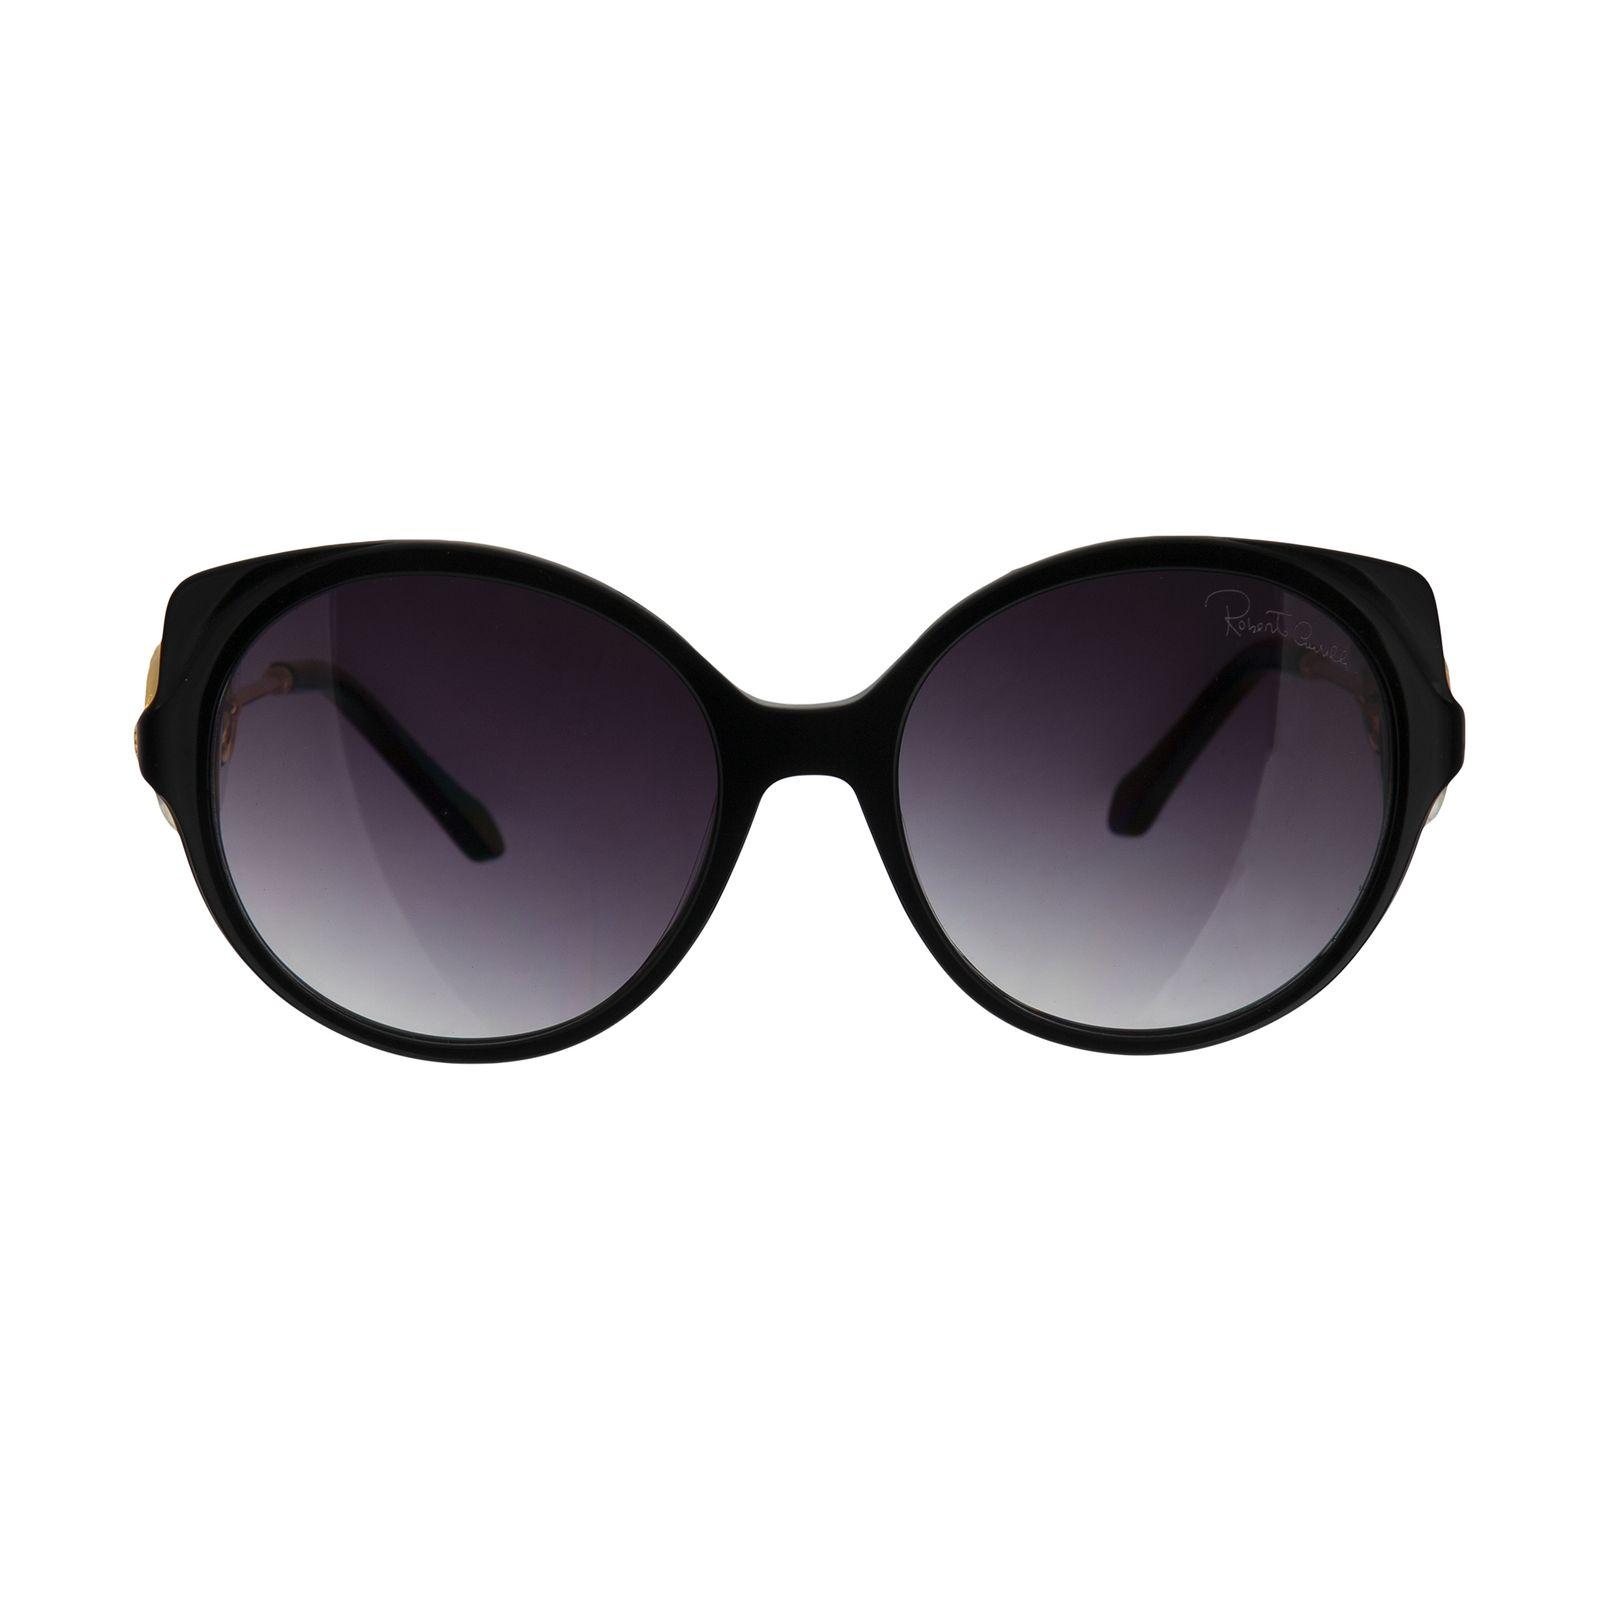 عینک آفتابی زنانه روبرتو کاوالی مدل 1035 -  - 2